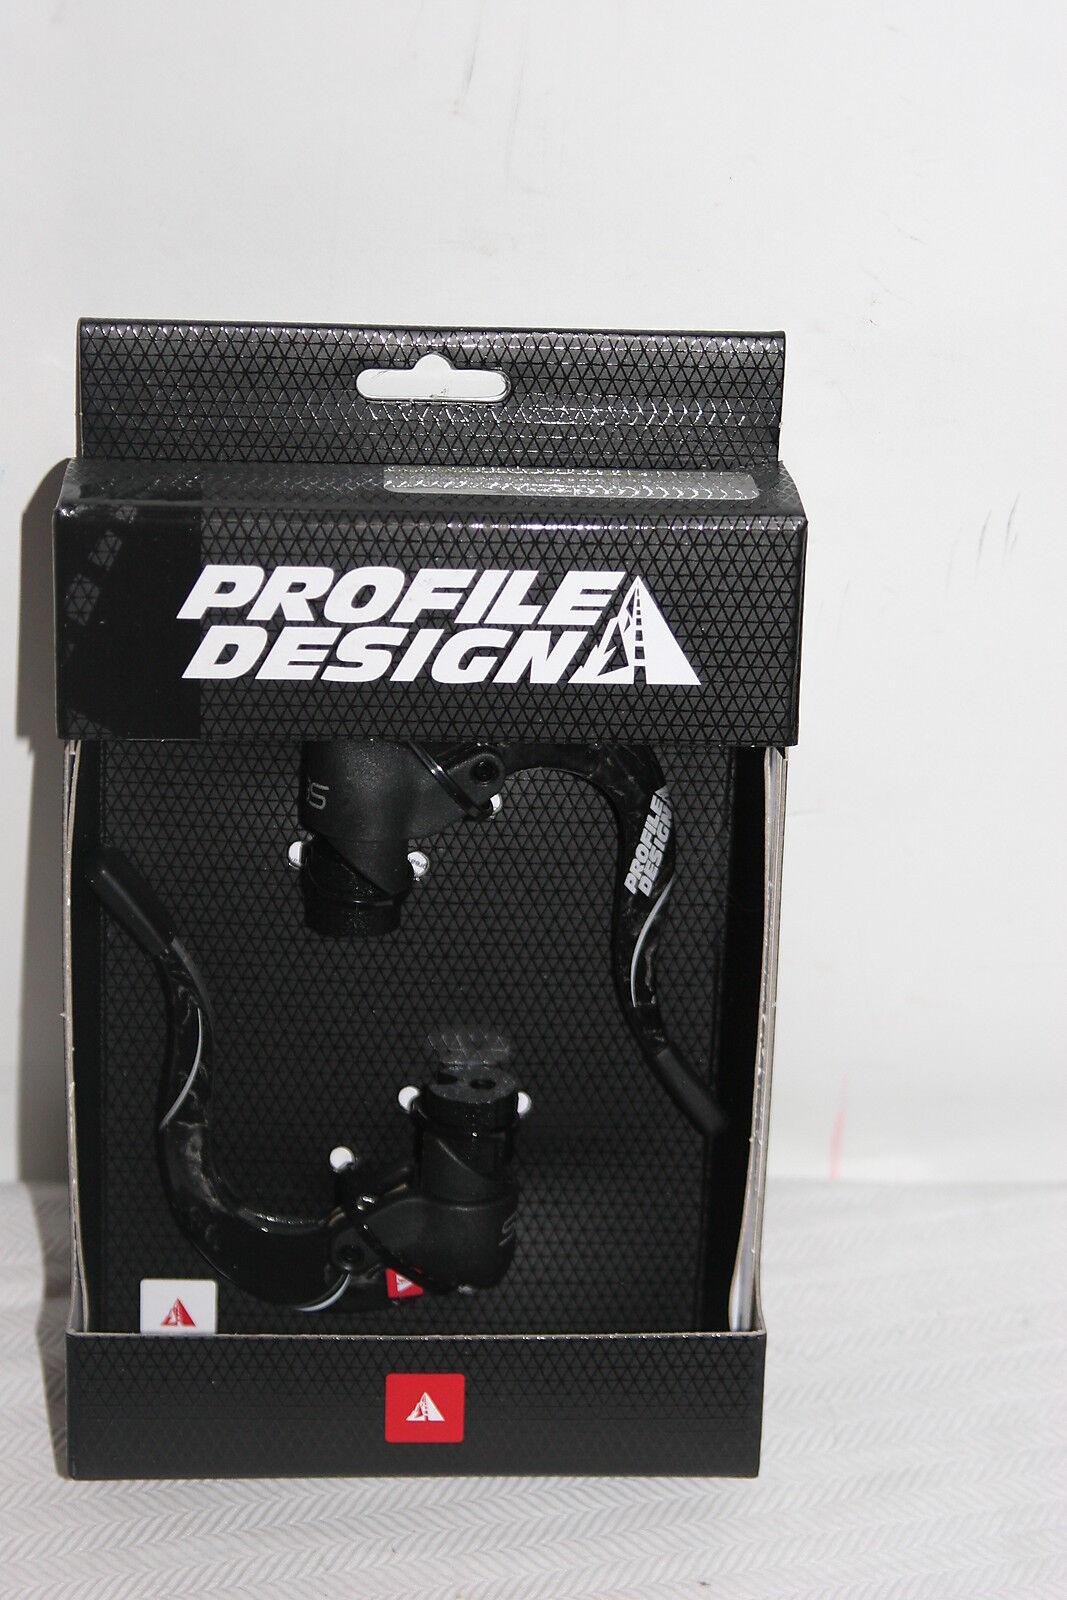 Diseño de perfil ABS semi-Cochebon Aero Bicicleta Palanca  De Freno Conjunto Negro Para Triatlón TT  autentico en linea